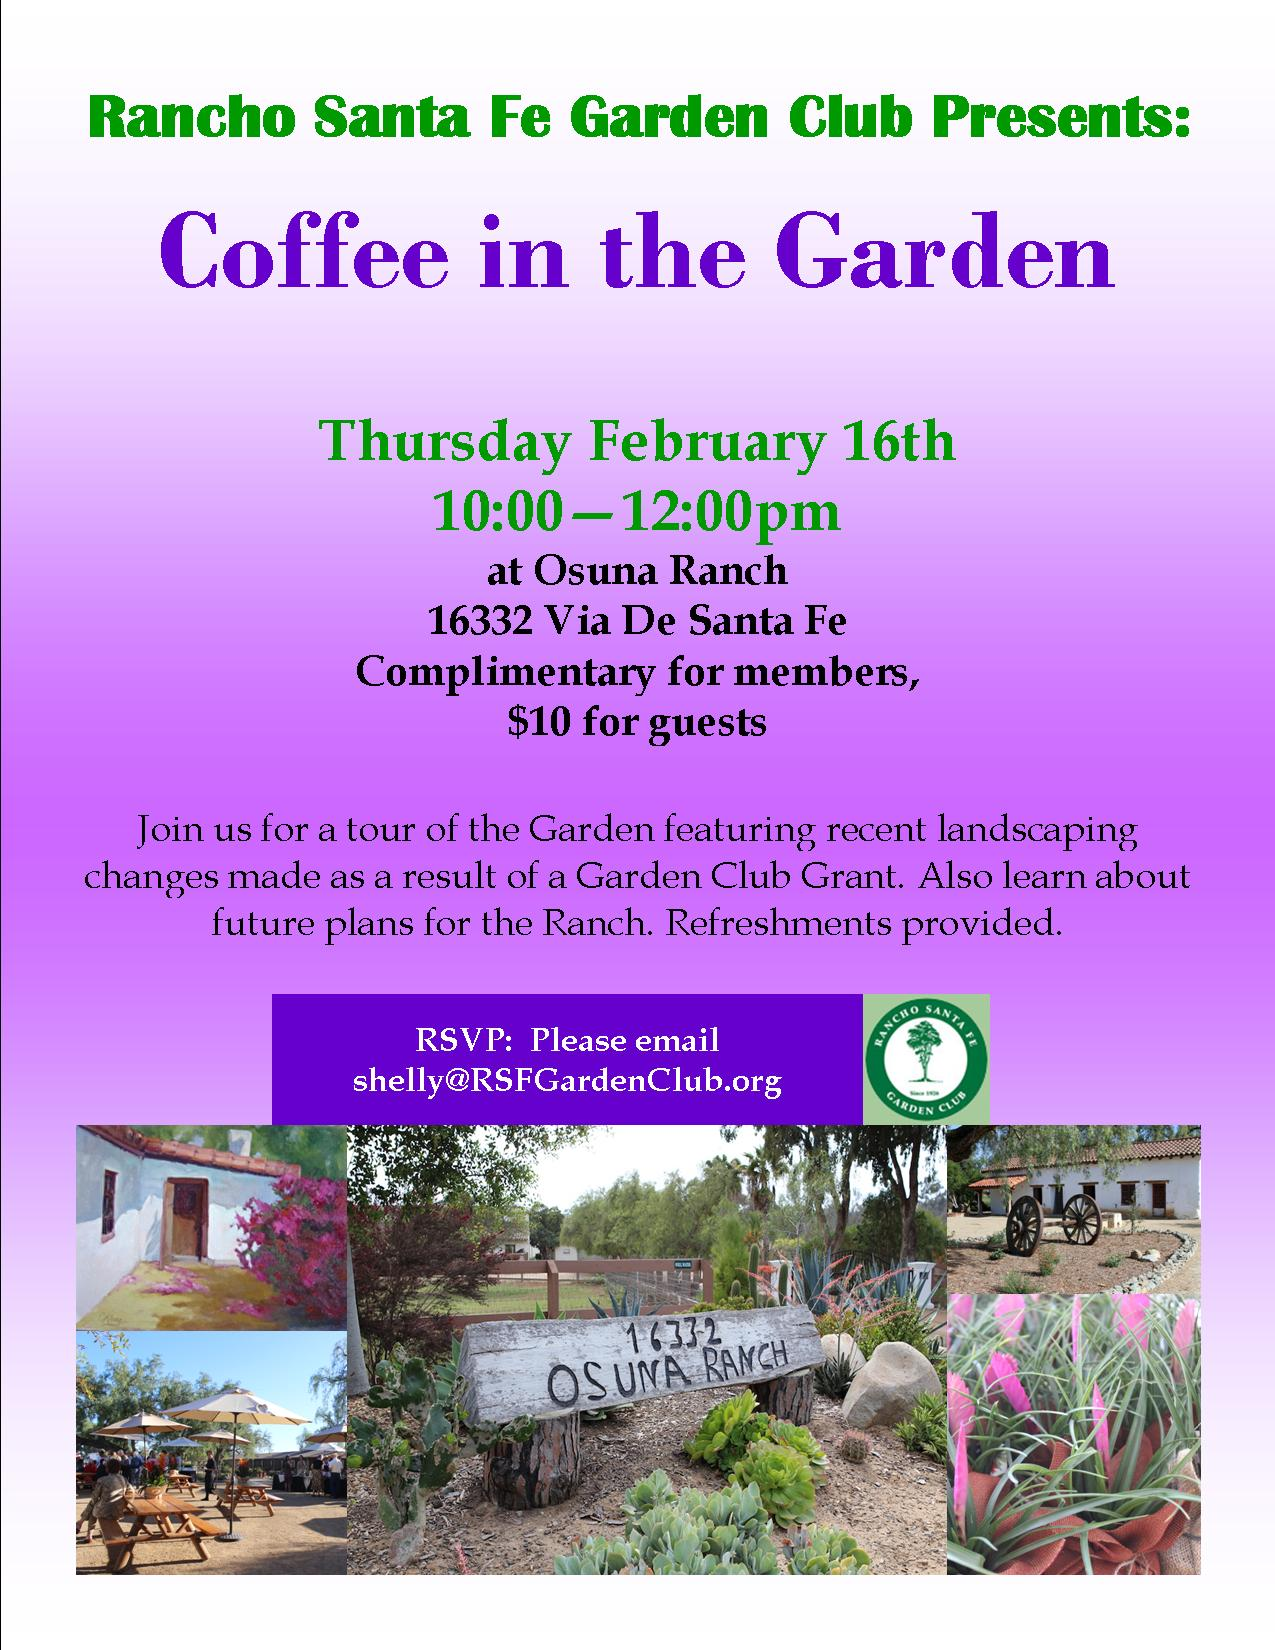 Coffee-in-the-Garden-02.16.17-1.jpg